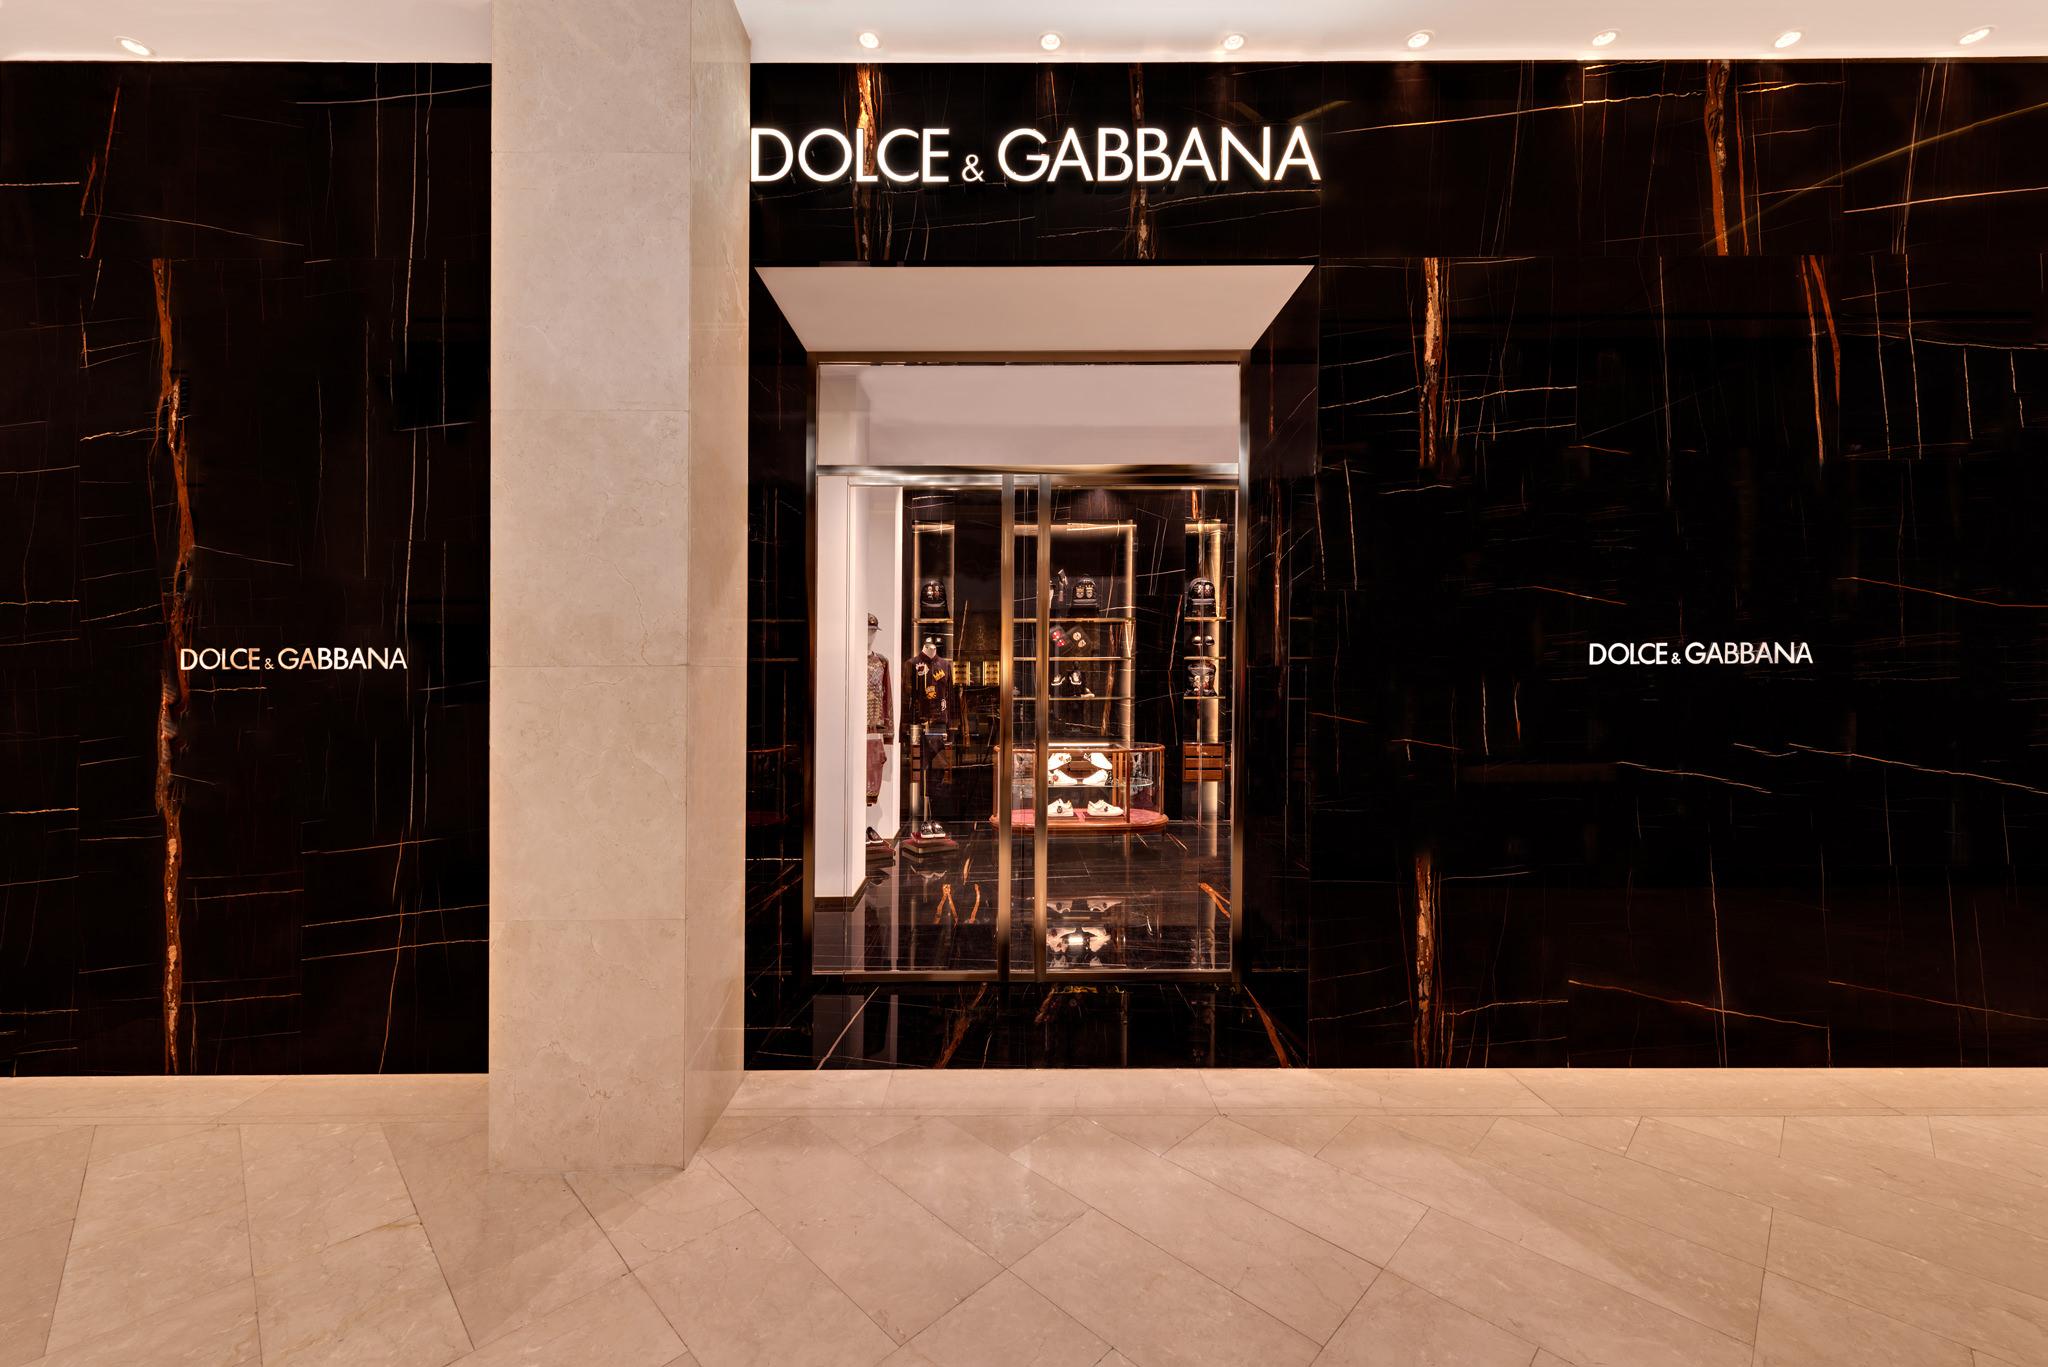 20171011 - Dolce & Gabbana - HCM - Commercial - Interior - Store - Retouch 0190.jpg